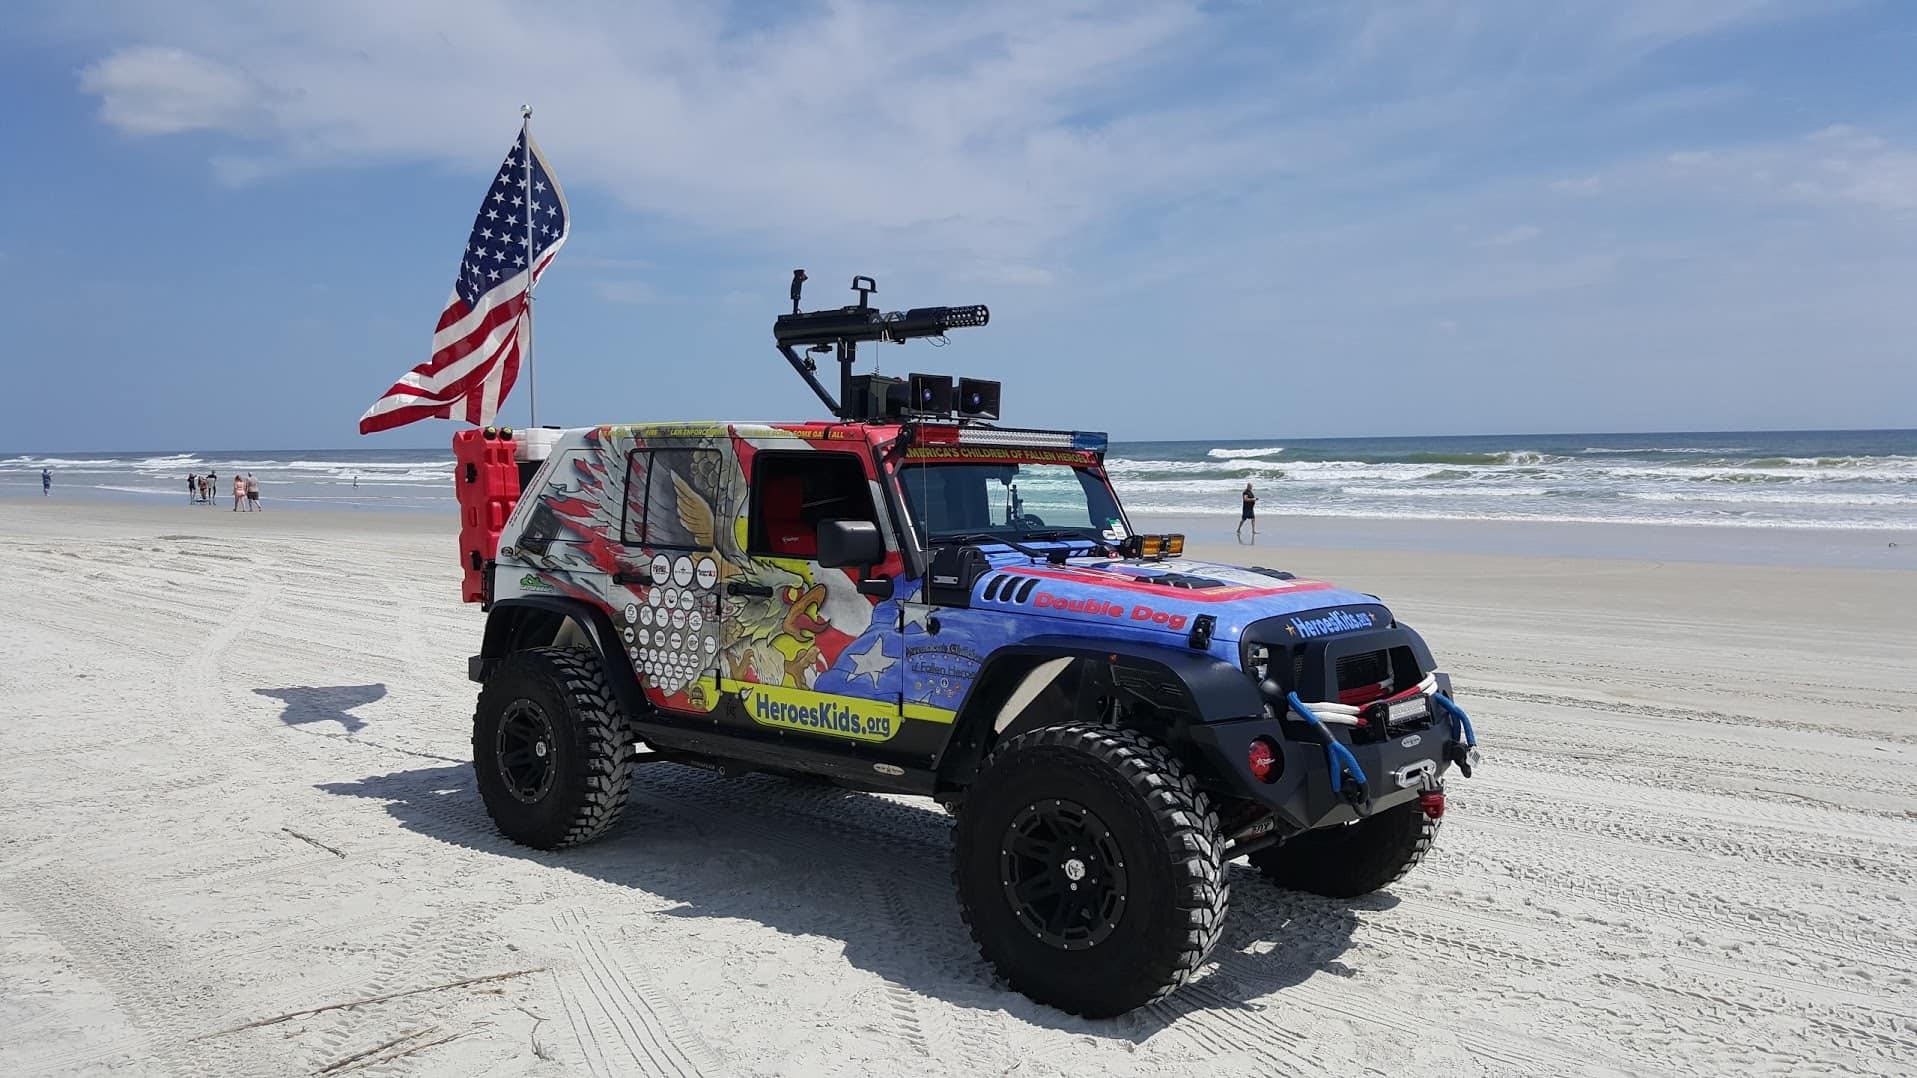 Double Dog on the Beach in Daytona